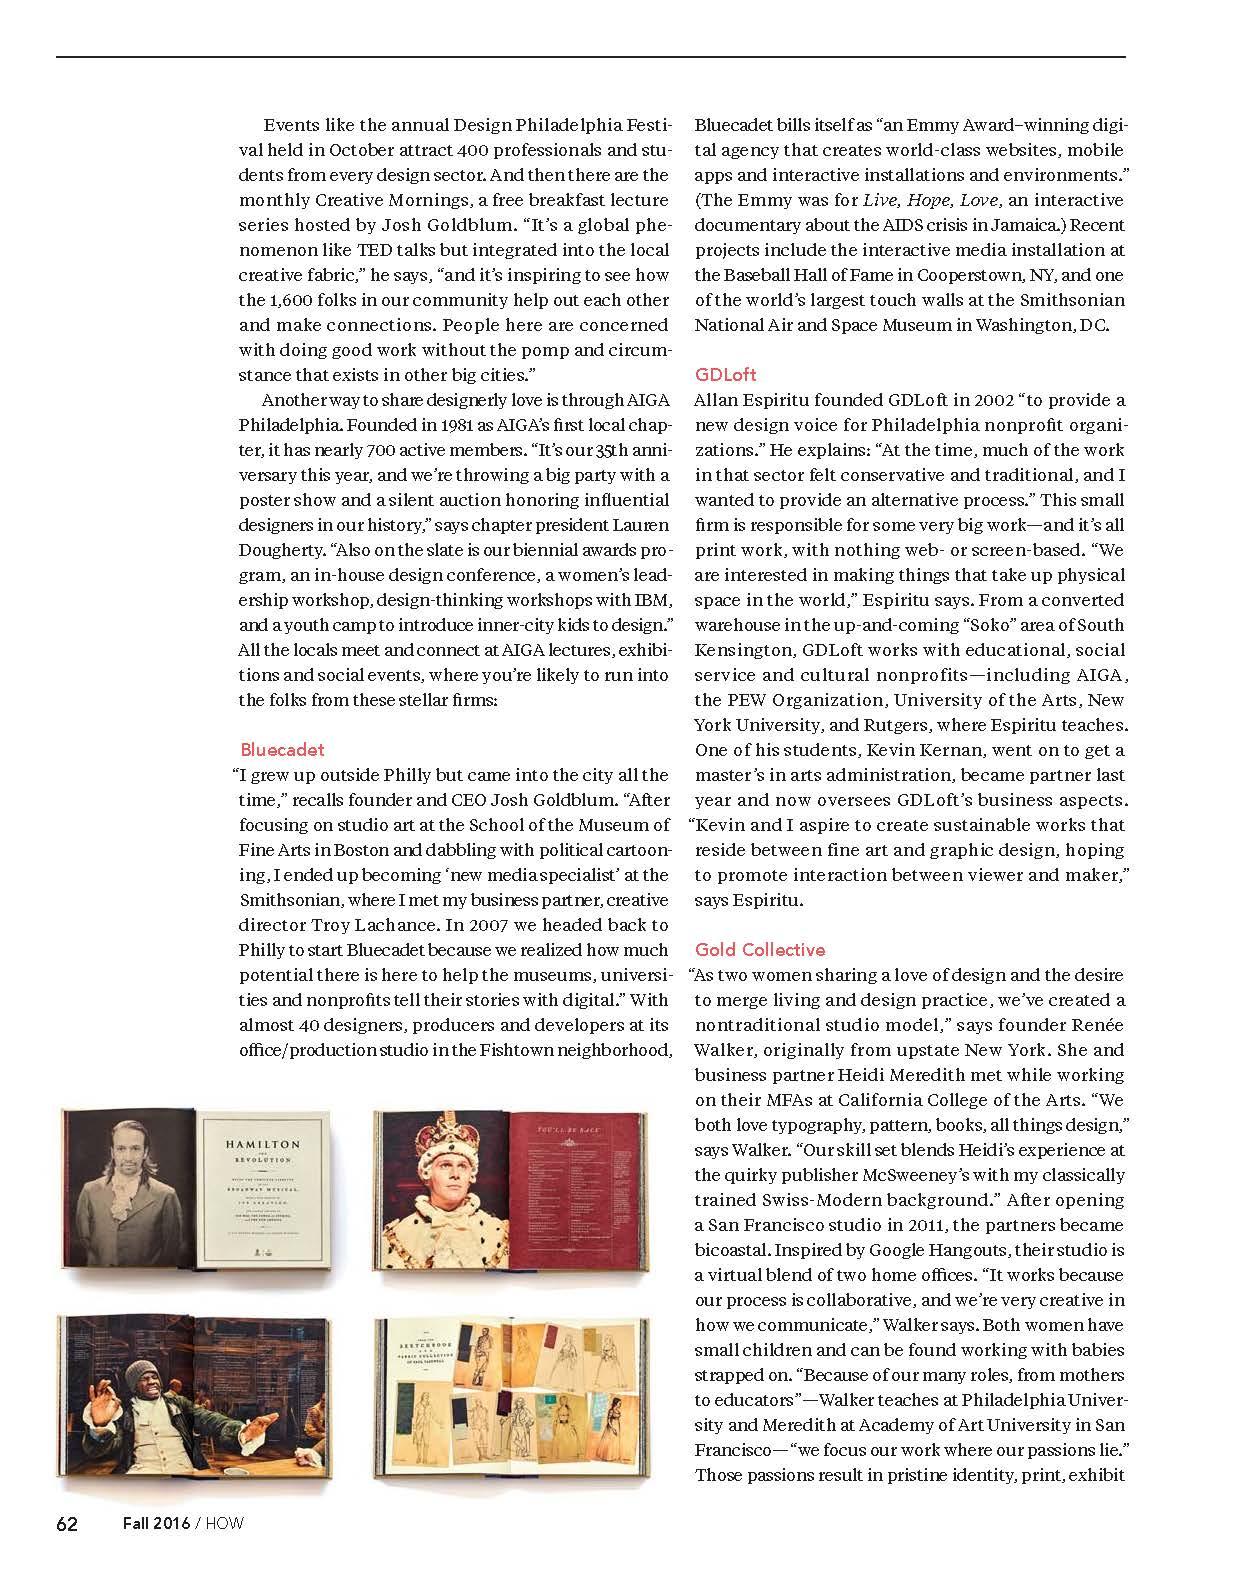 HOW_Philadelphia City of Designerly Love (1)_Page_4.jpg